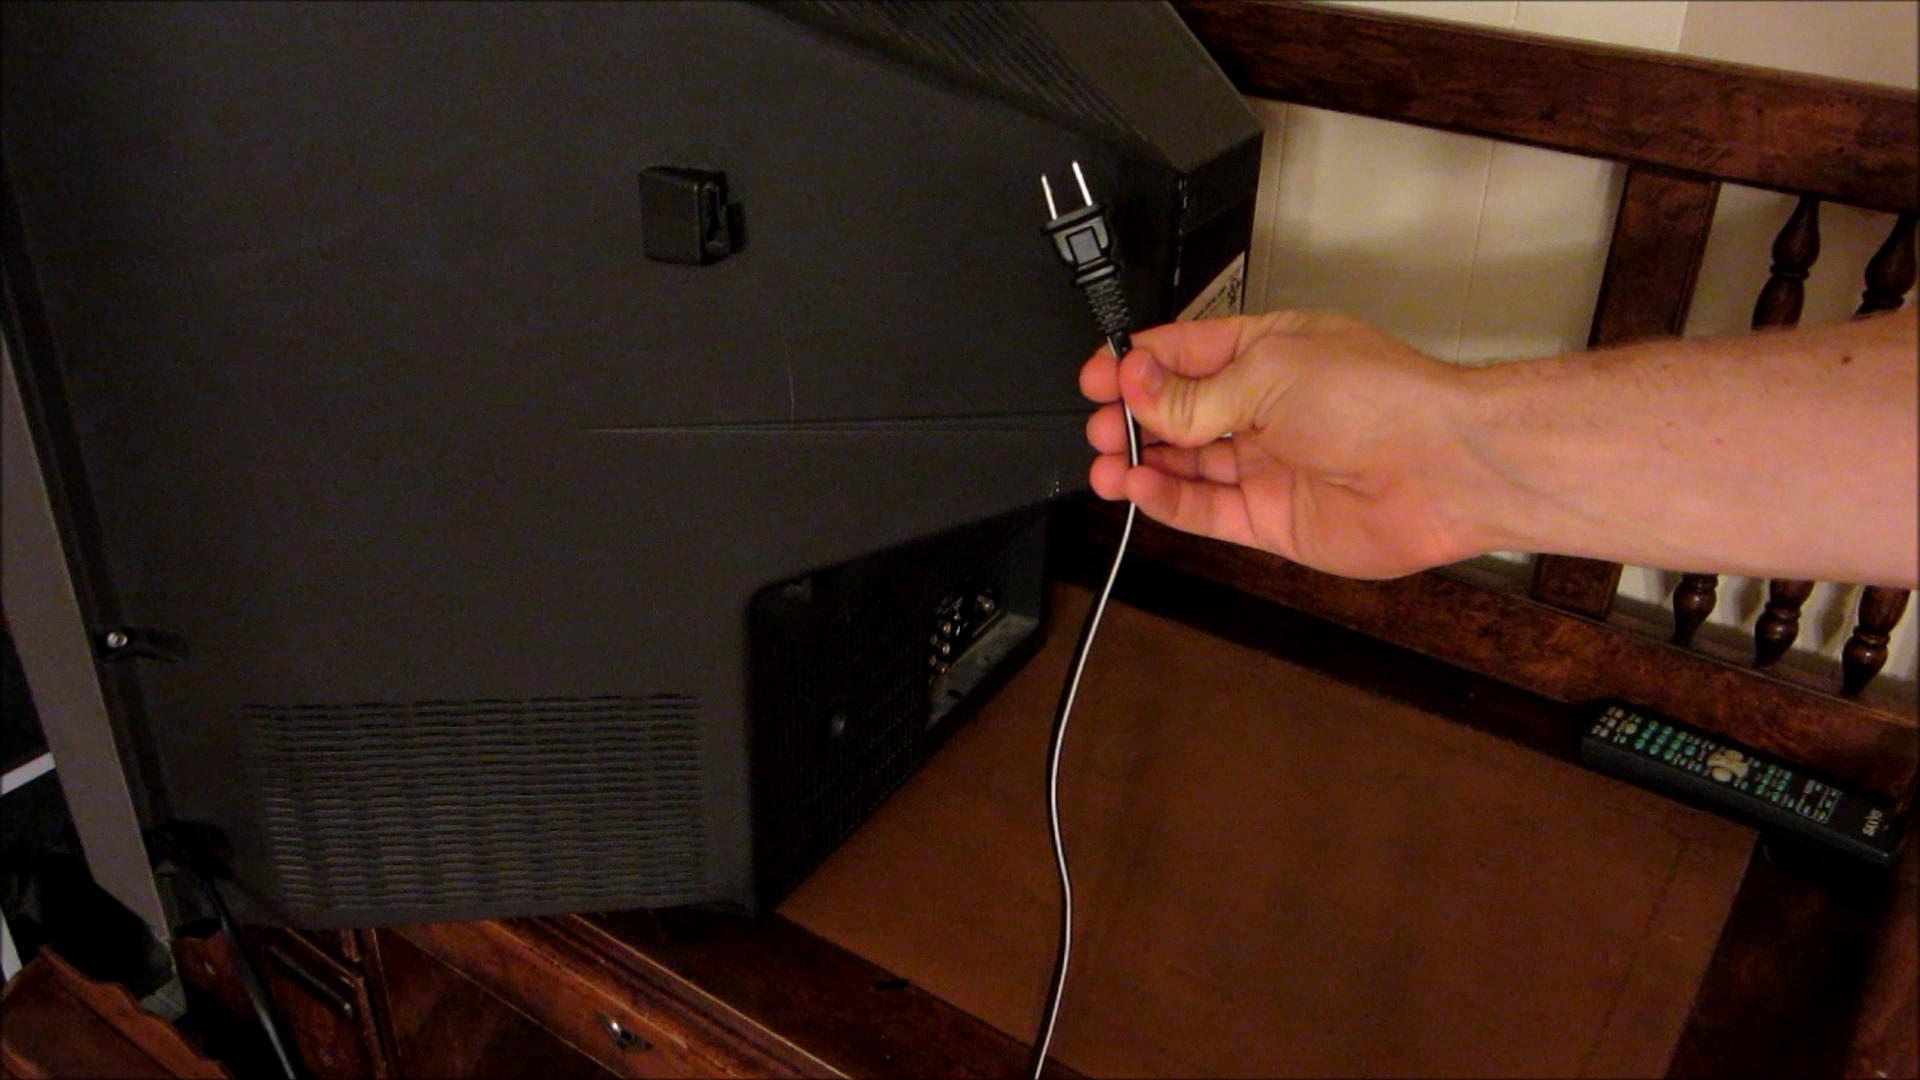 DIY Hacks & How-To's: Haunted TVPrank